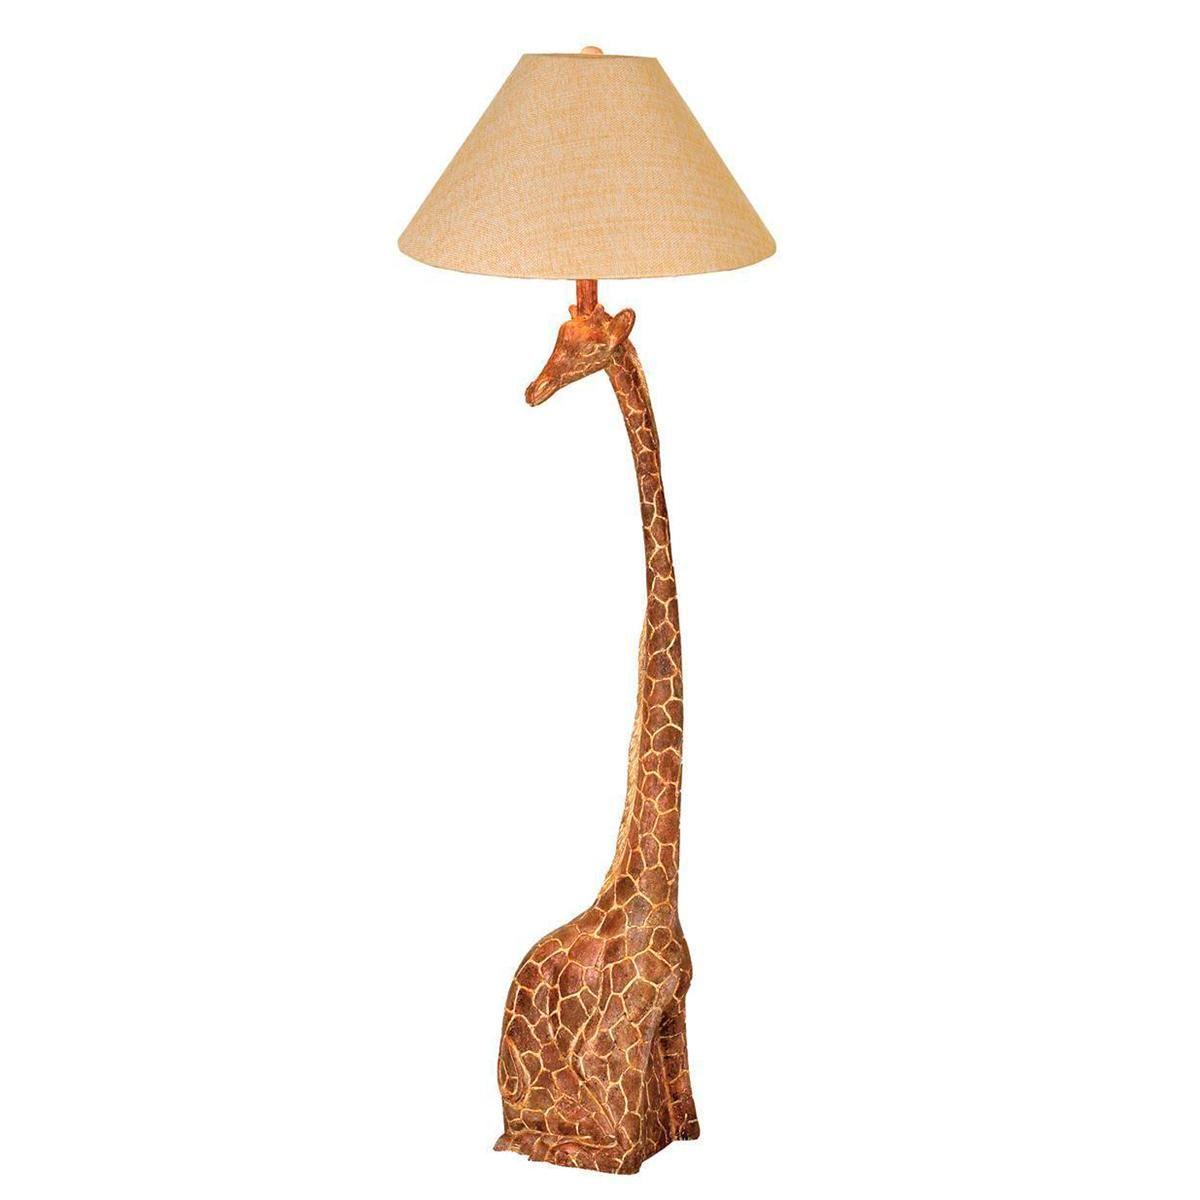 giraffe floor lamp cute for nursery - Giraffe Lamp